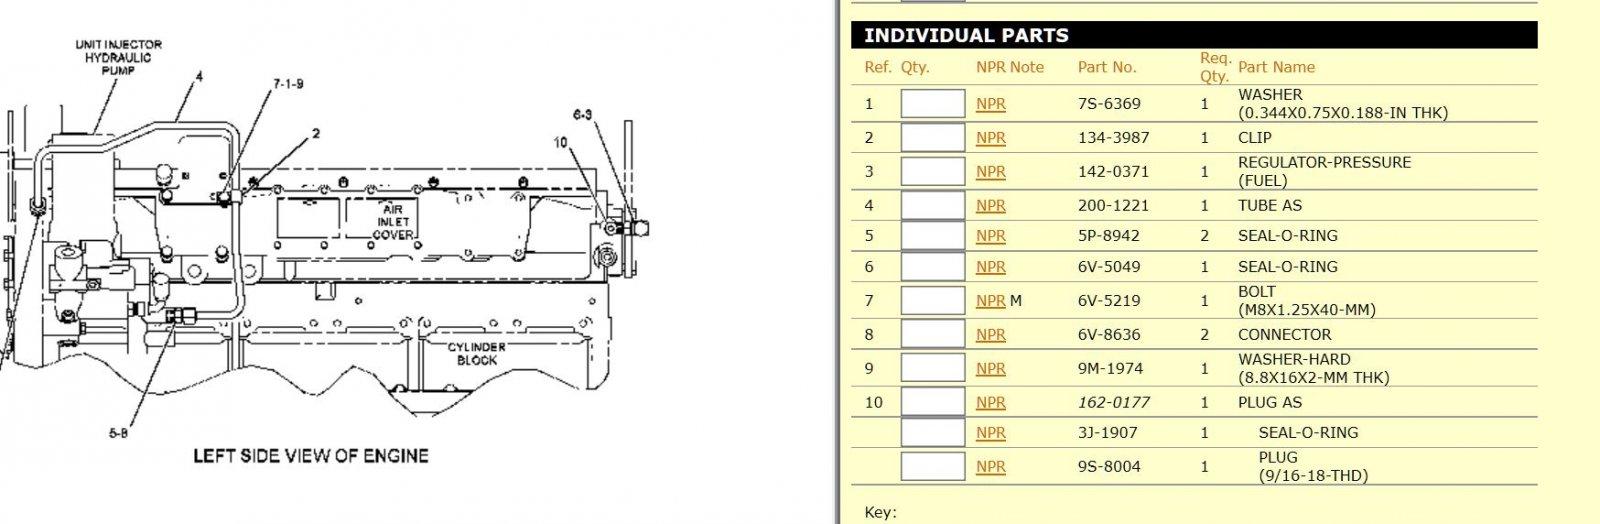 Click image for larger version  Name:CKM31166 regulator valve.jpg Views:3 Size:123.9 KB ID:246393